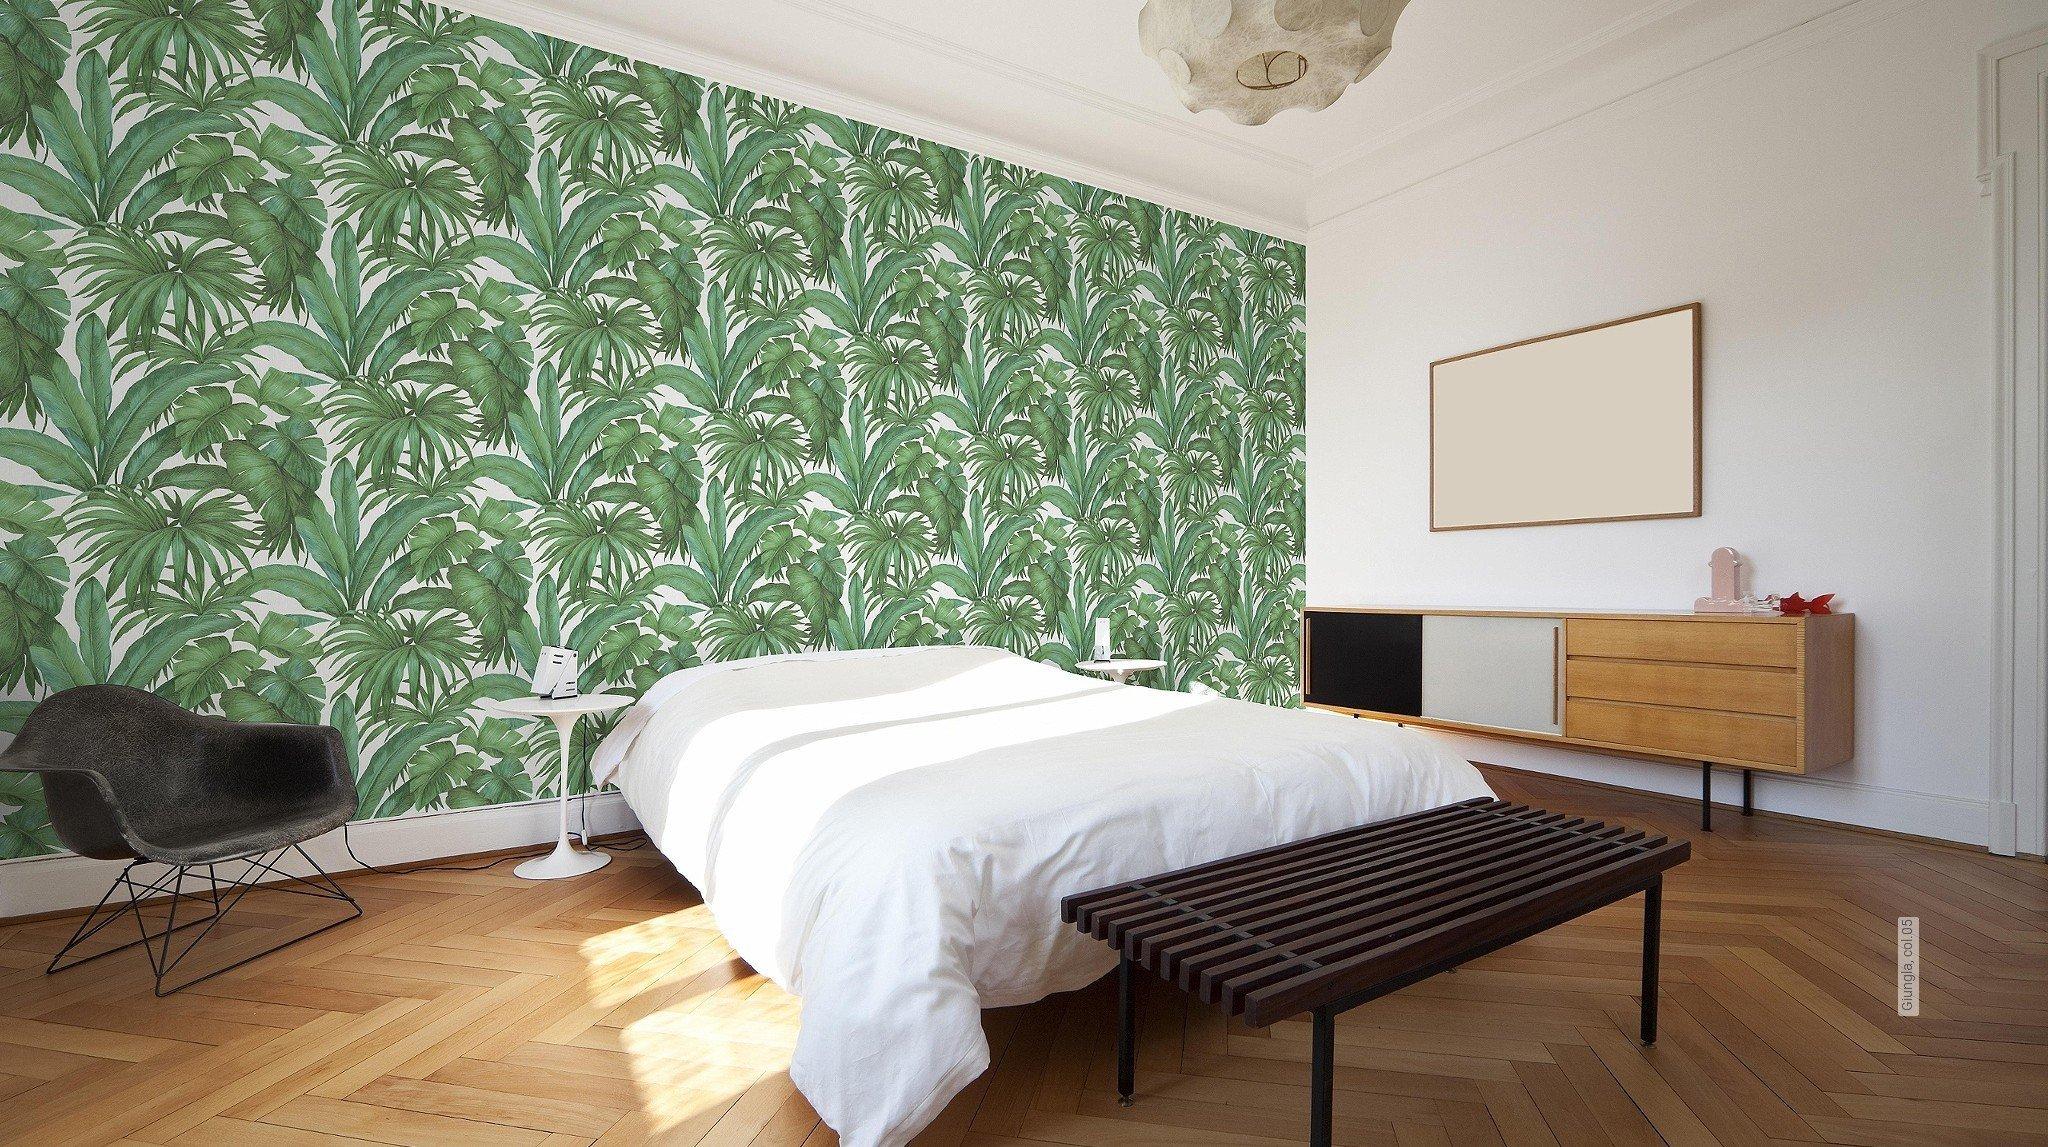 florale muster tapeten lust auf was neues. Black Bedroom Furniture Sets. Home Design Ideas